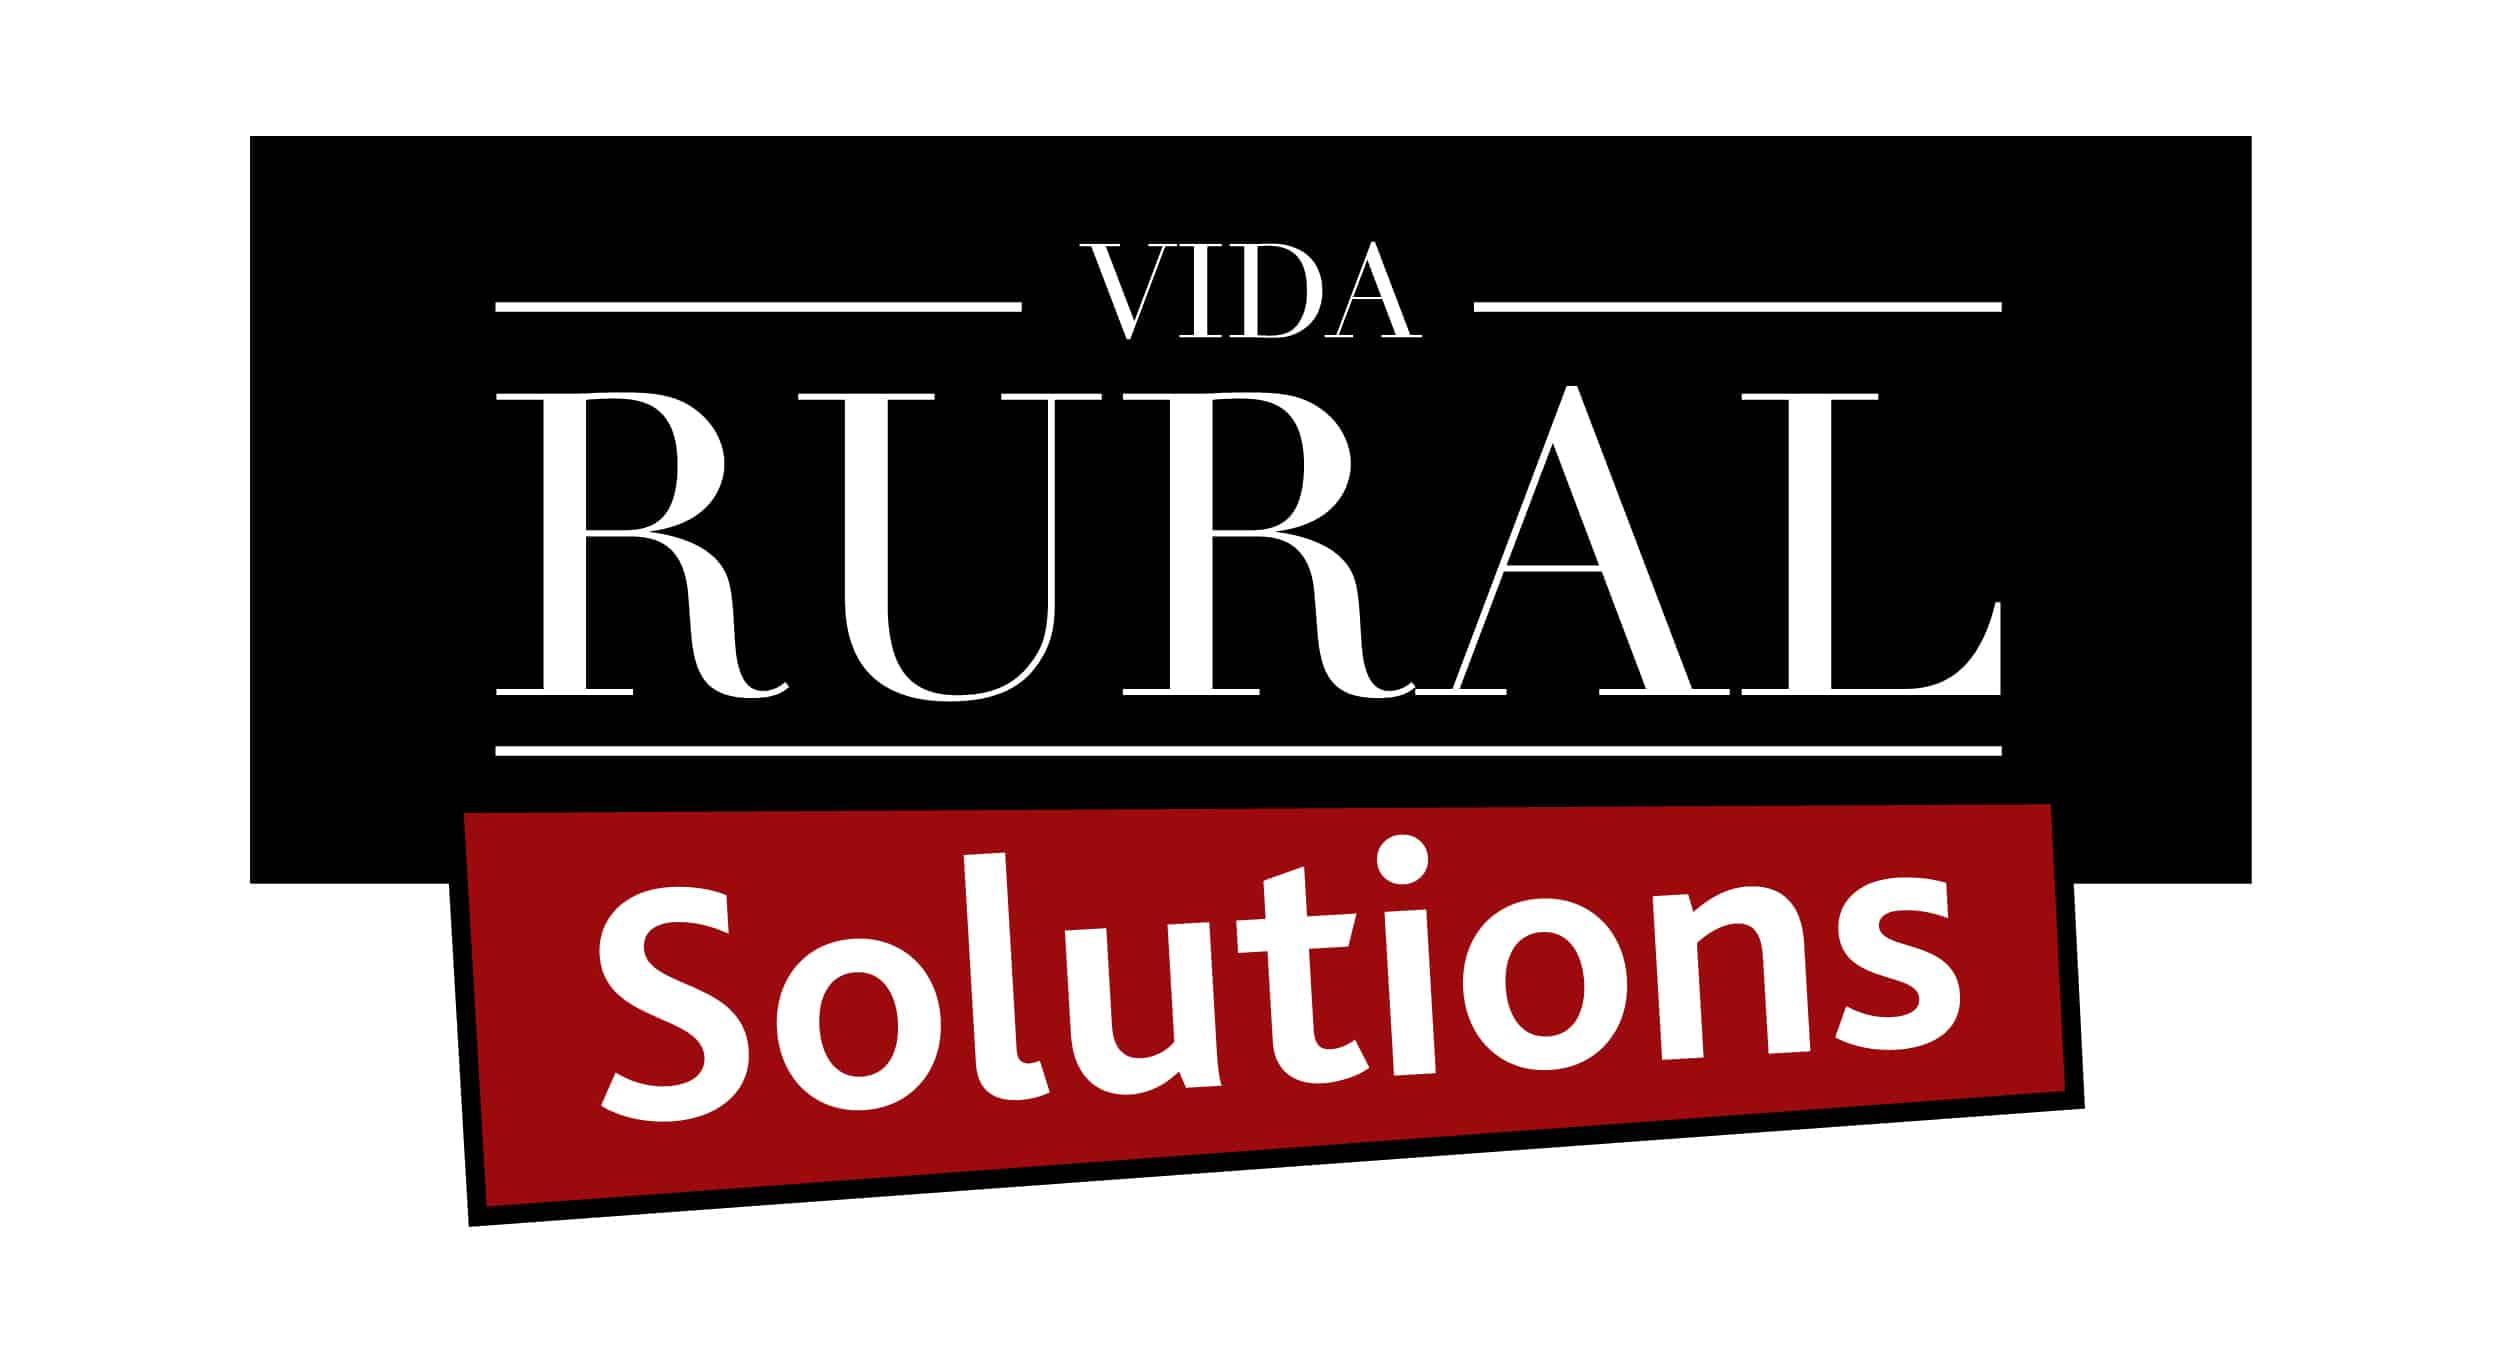 Vida Rural Solutions